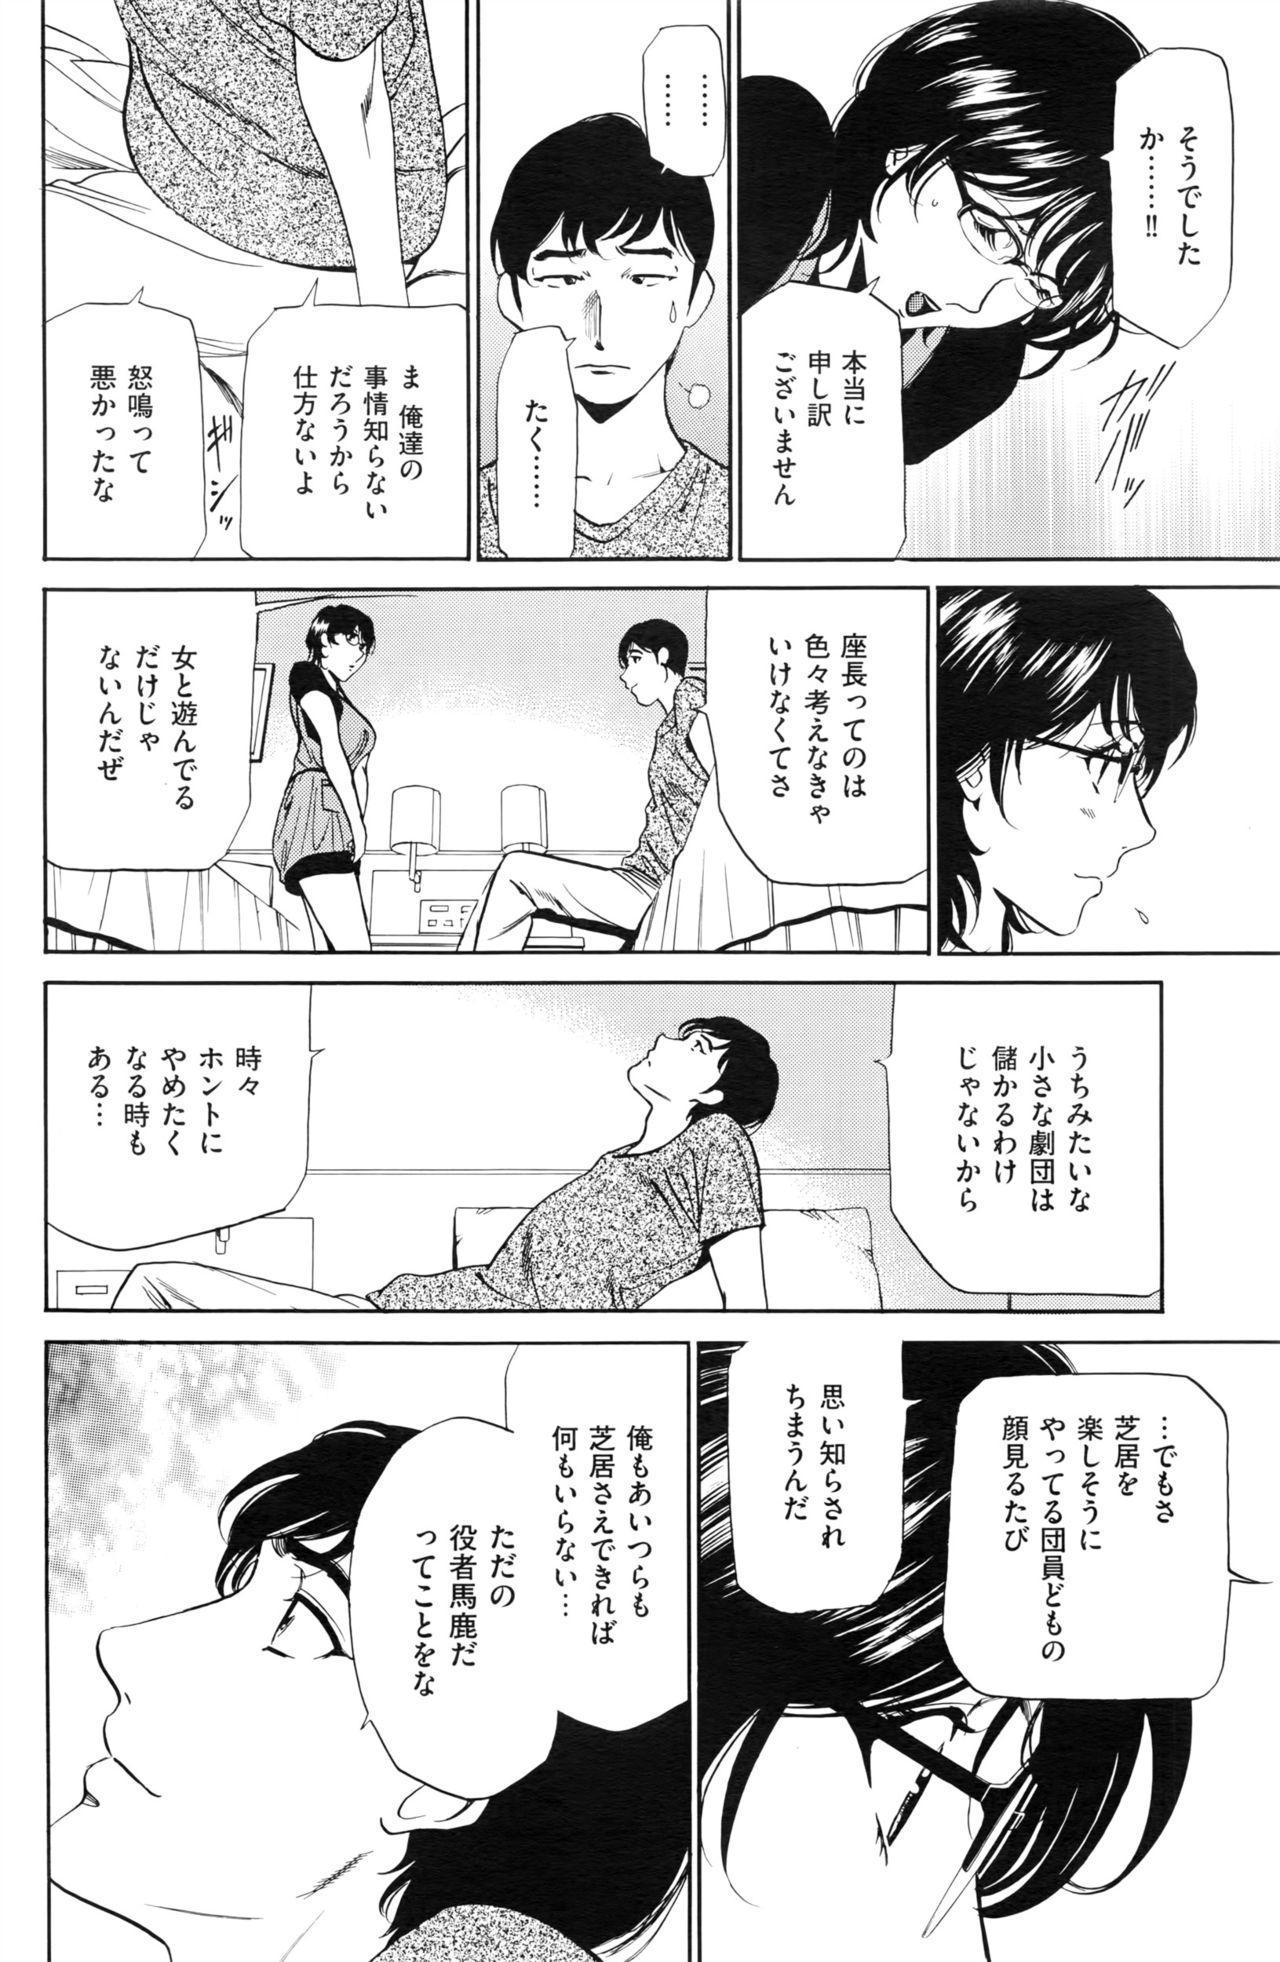 Wa Usuki Ipa a 1-10 66